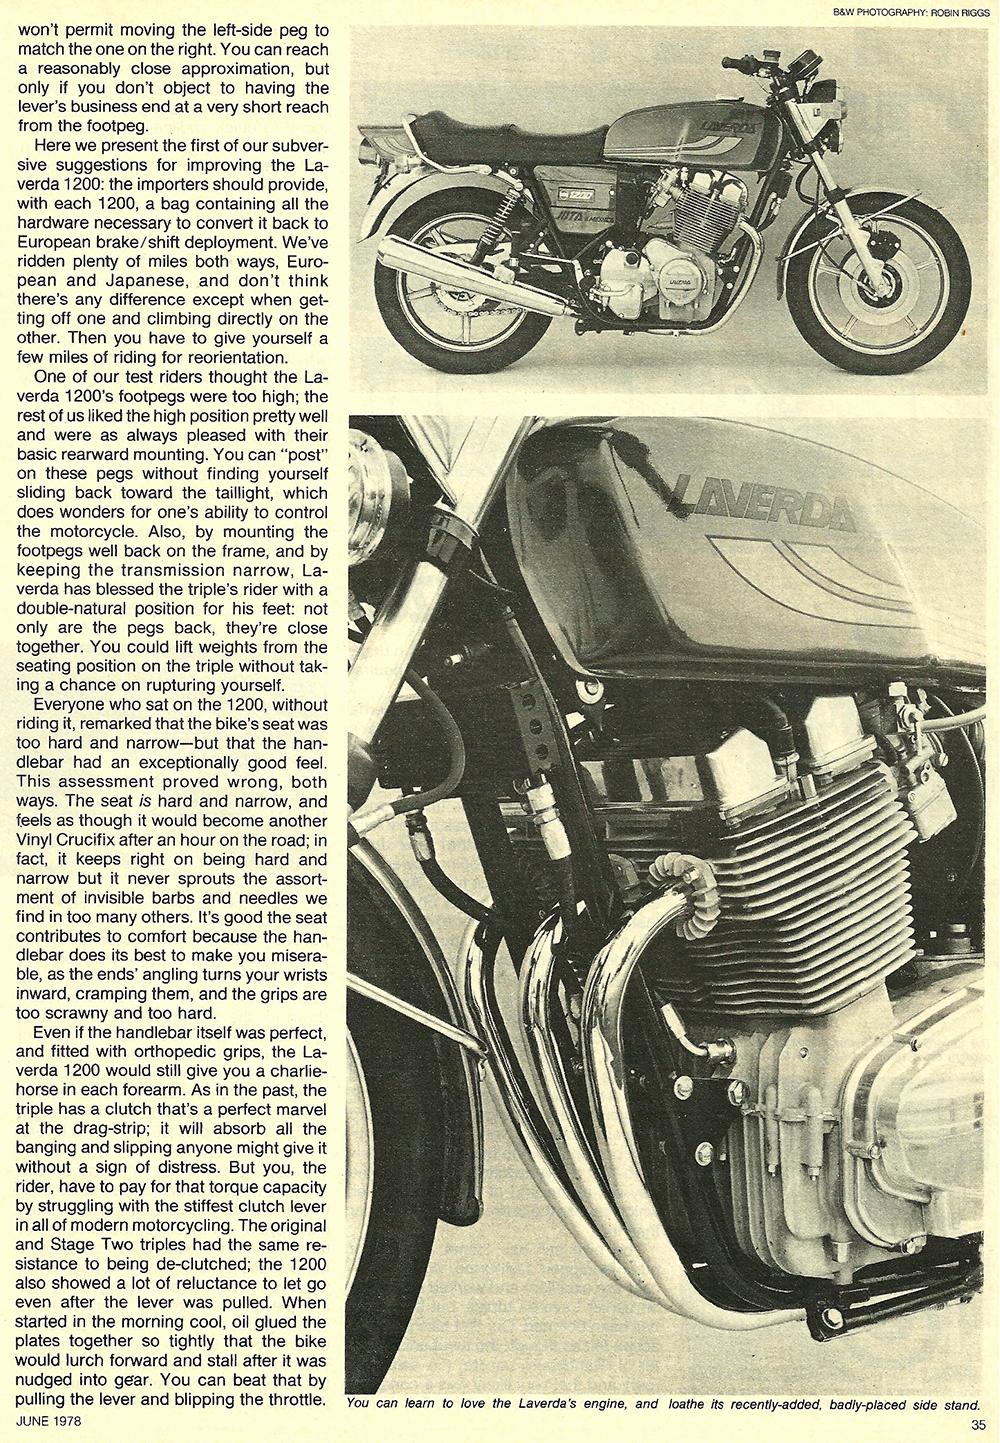 1978 Laverda 1200 Jota America road test 4.jpg